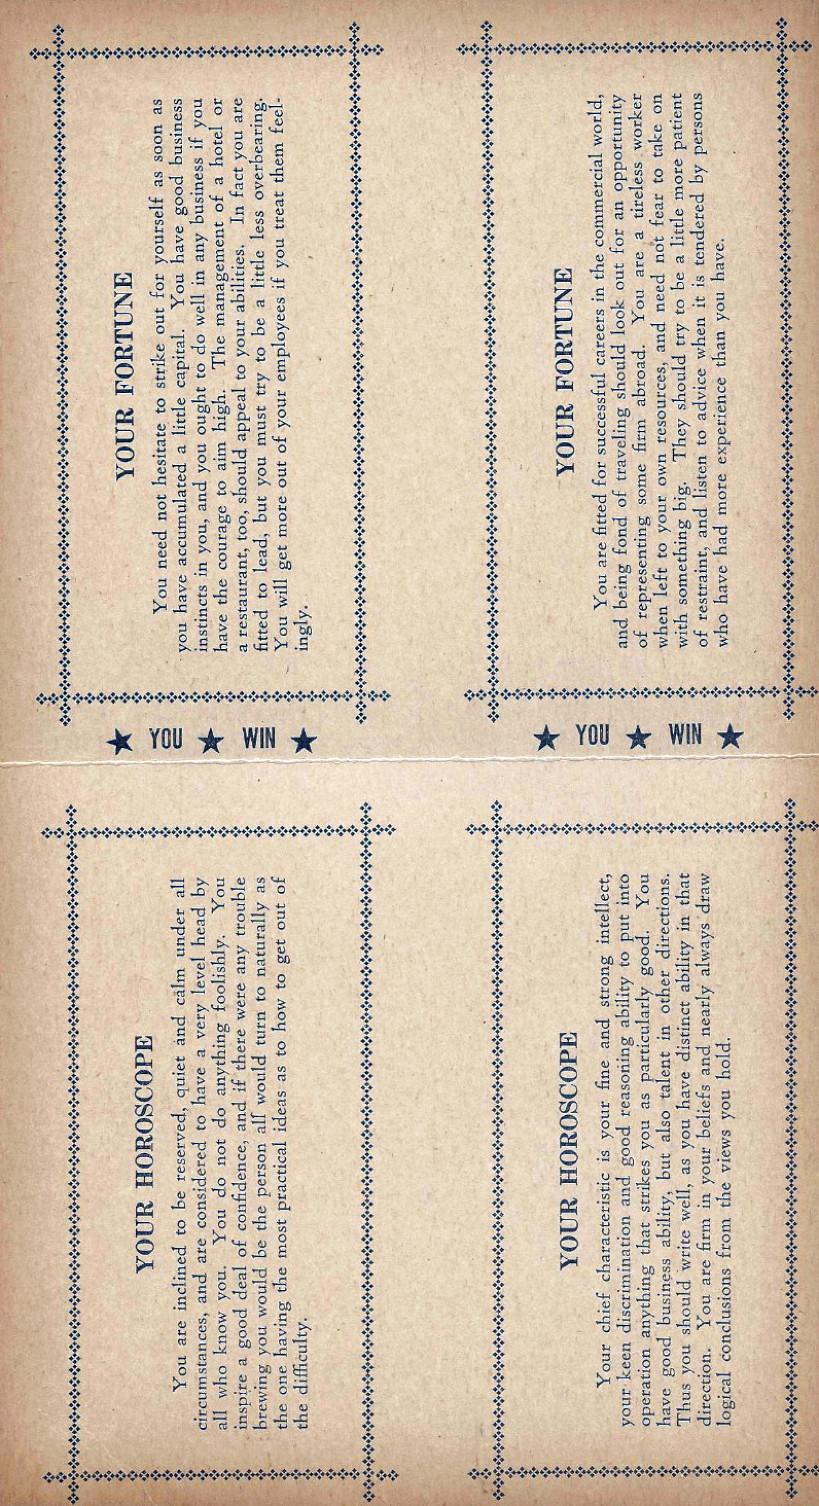 carole lombard fortune card 03a